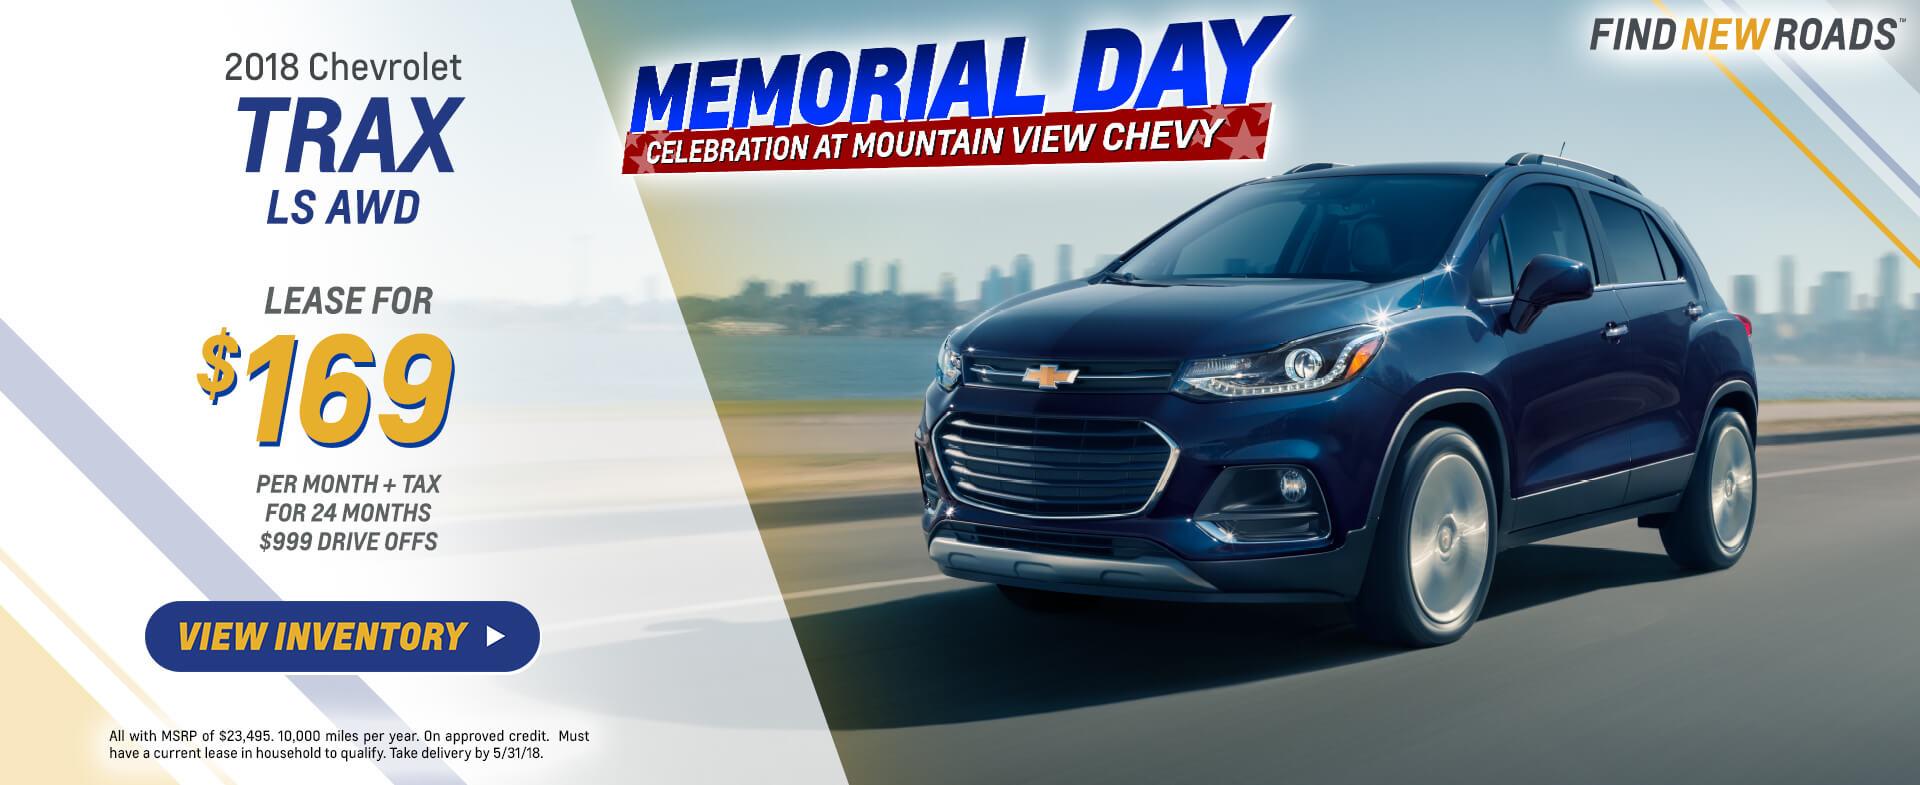 2018 Chevrolet Trax $169